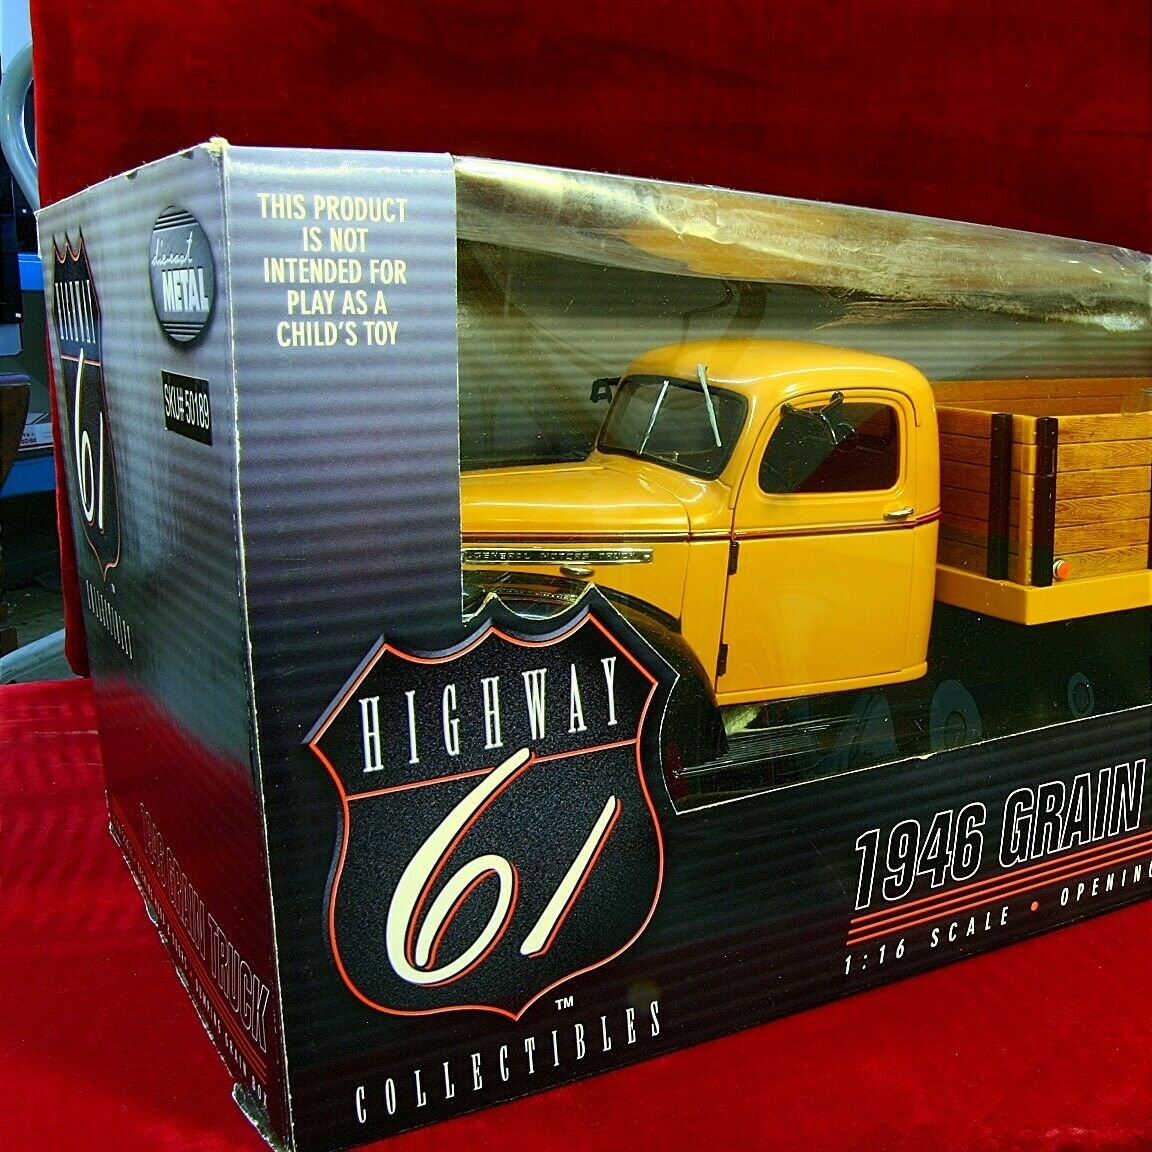 SUPERBE & New Highway 61 - 1946 GMC Farm Grain camion grande échelle 1 16